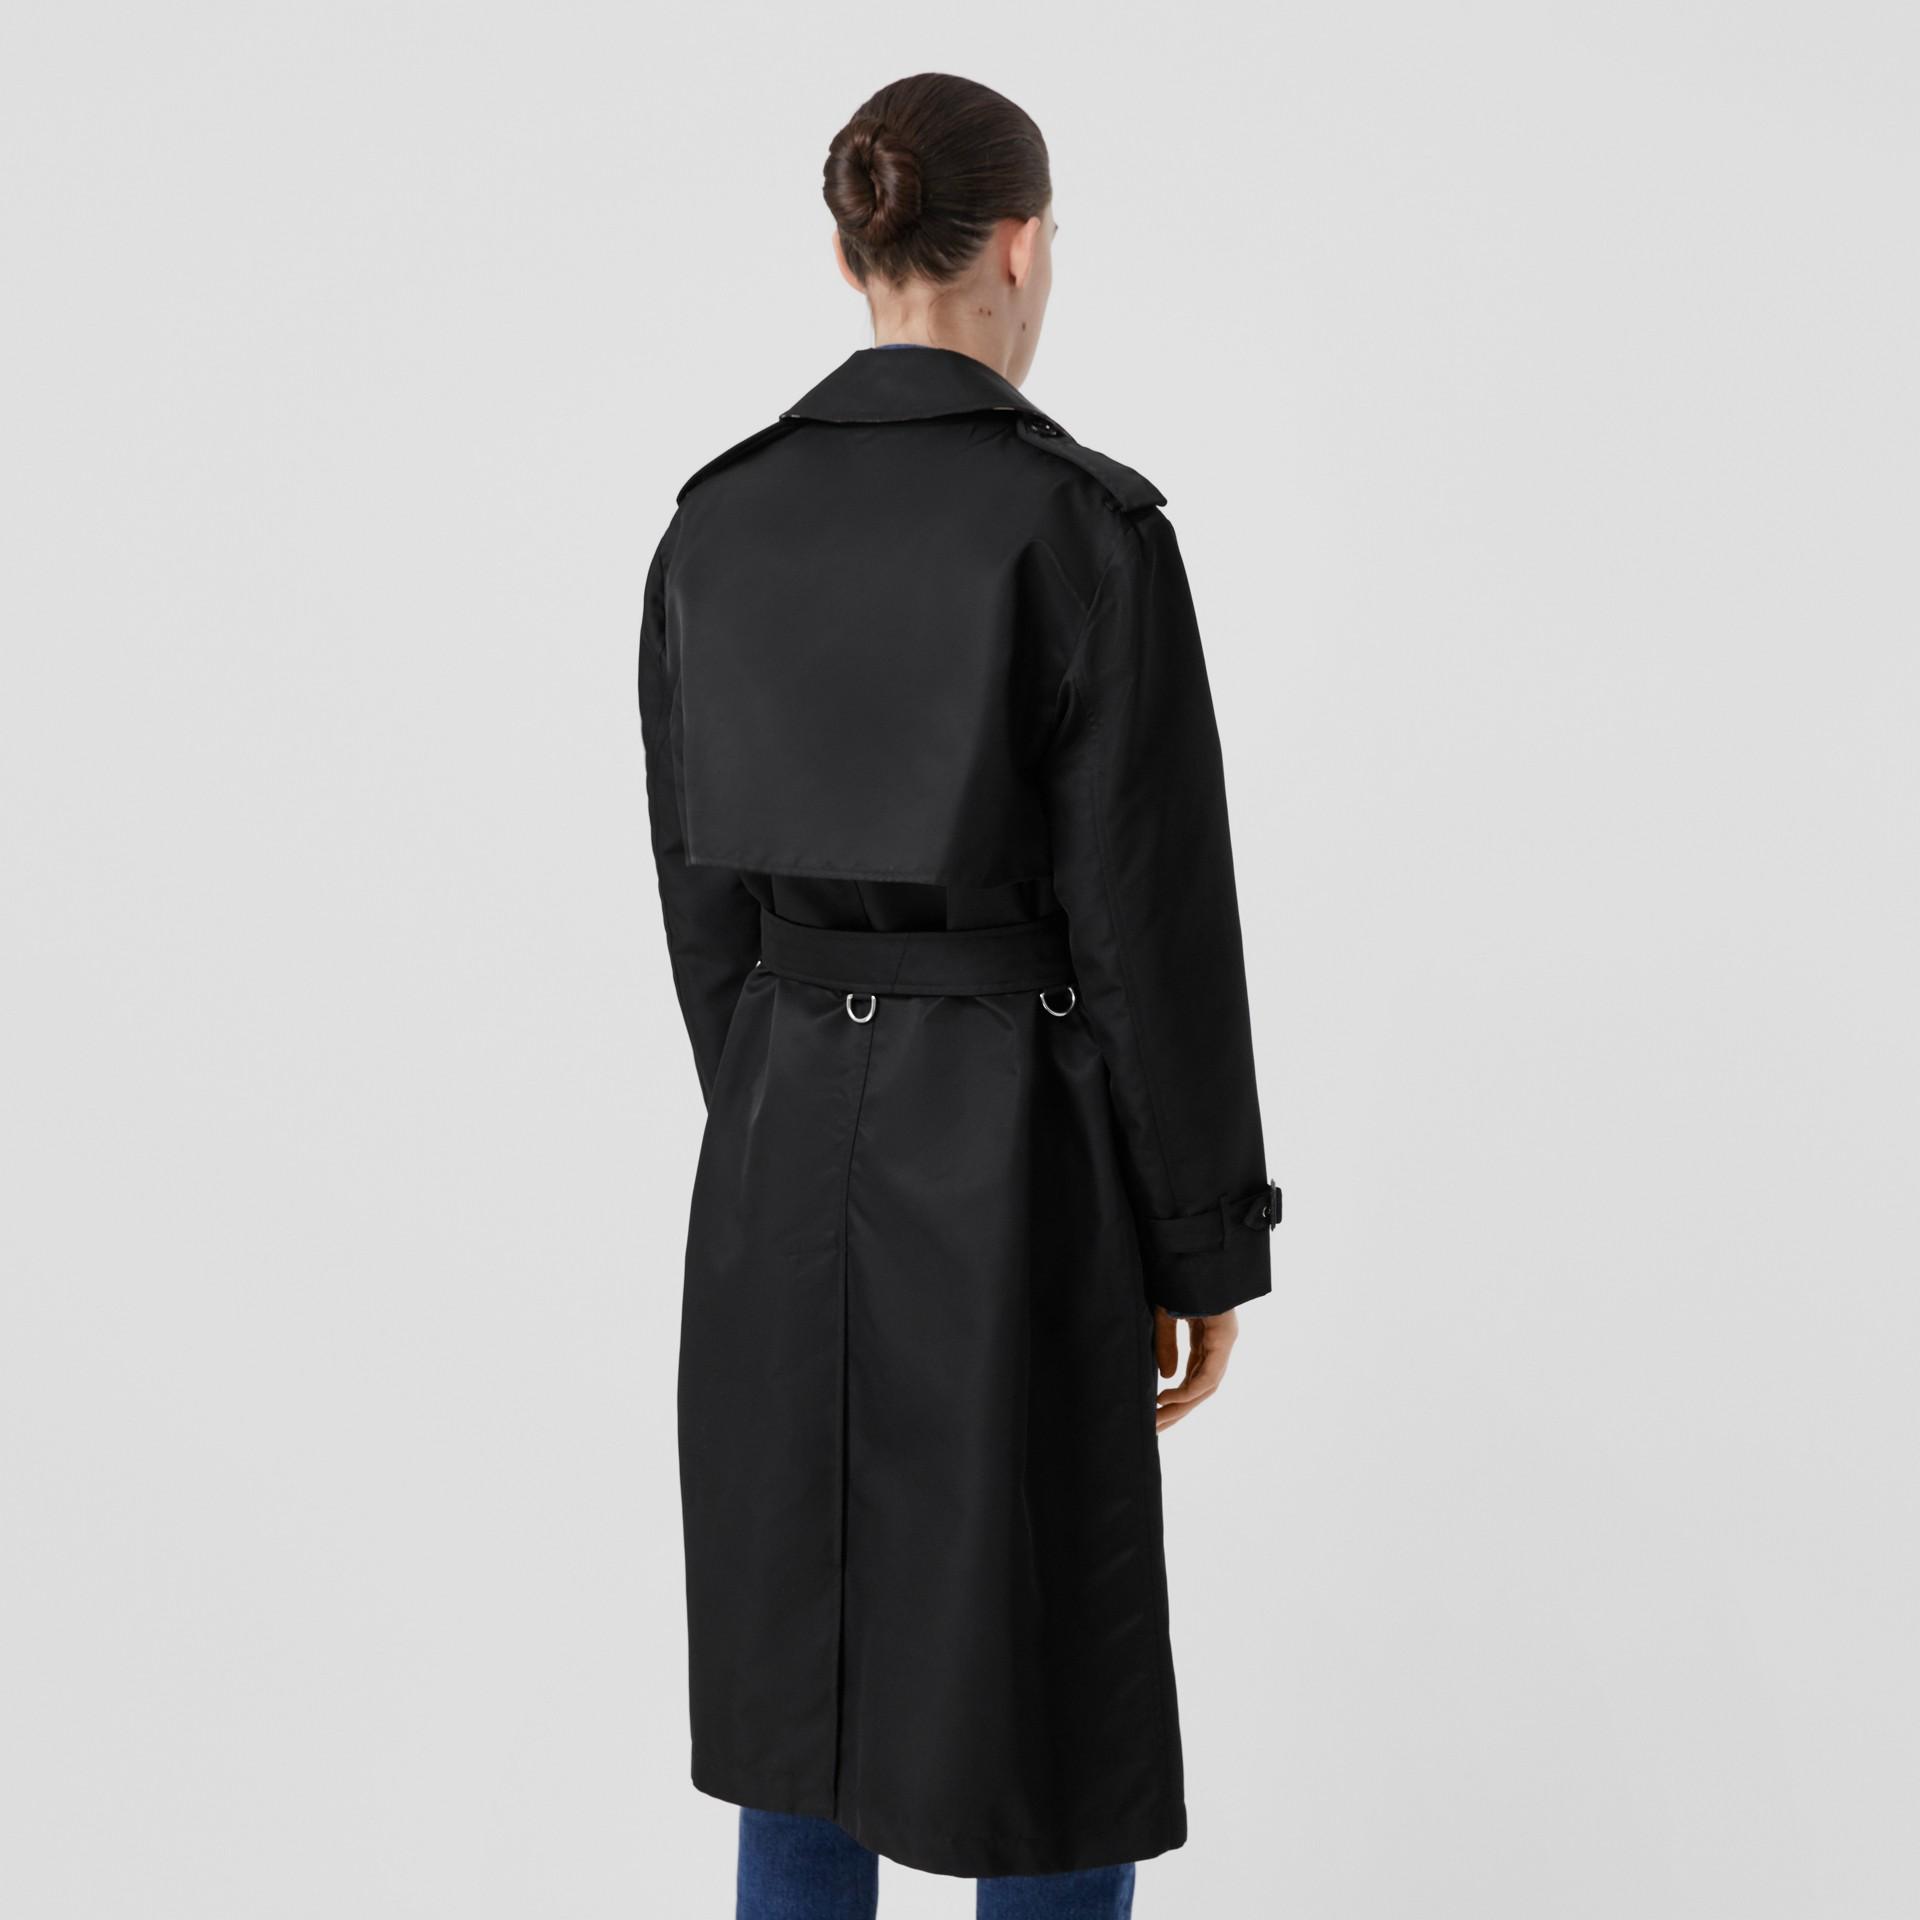 Nylon Twill Trench Coat in Black - Women | Burberry Australia - gallery image 2